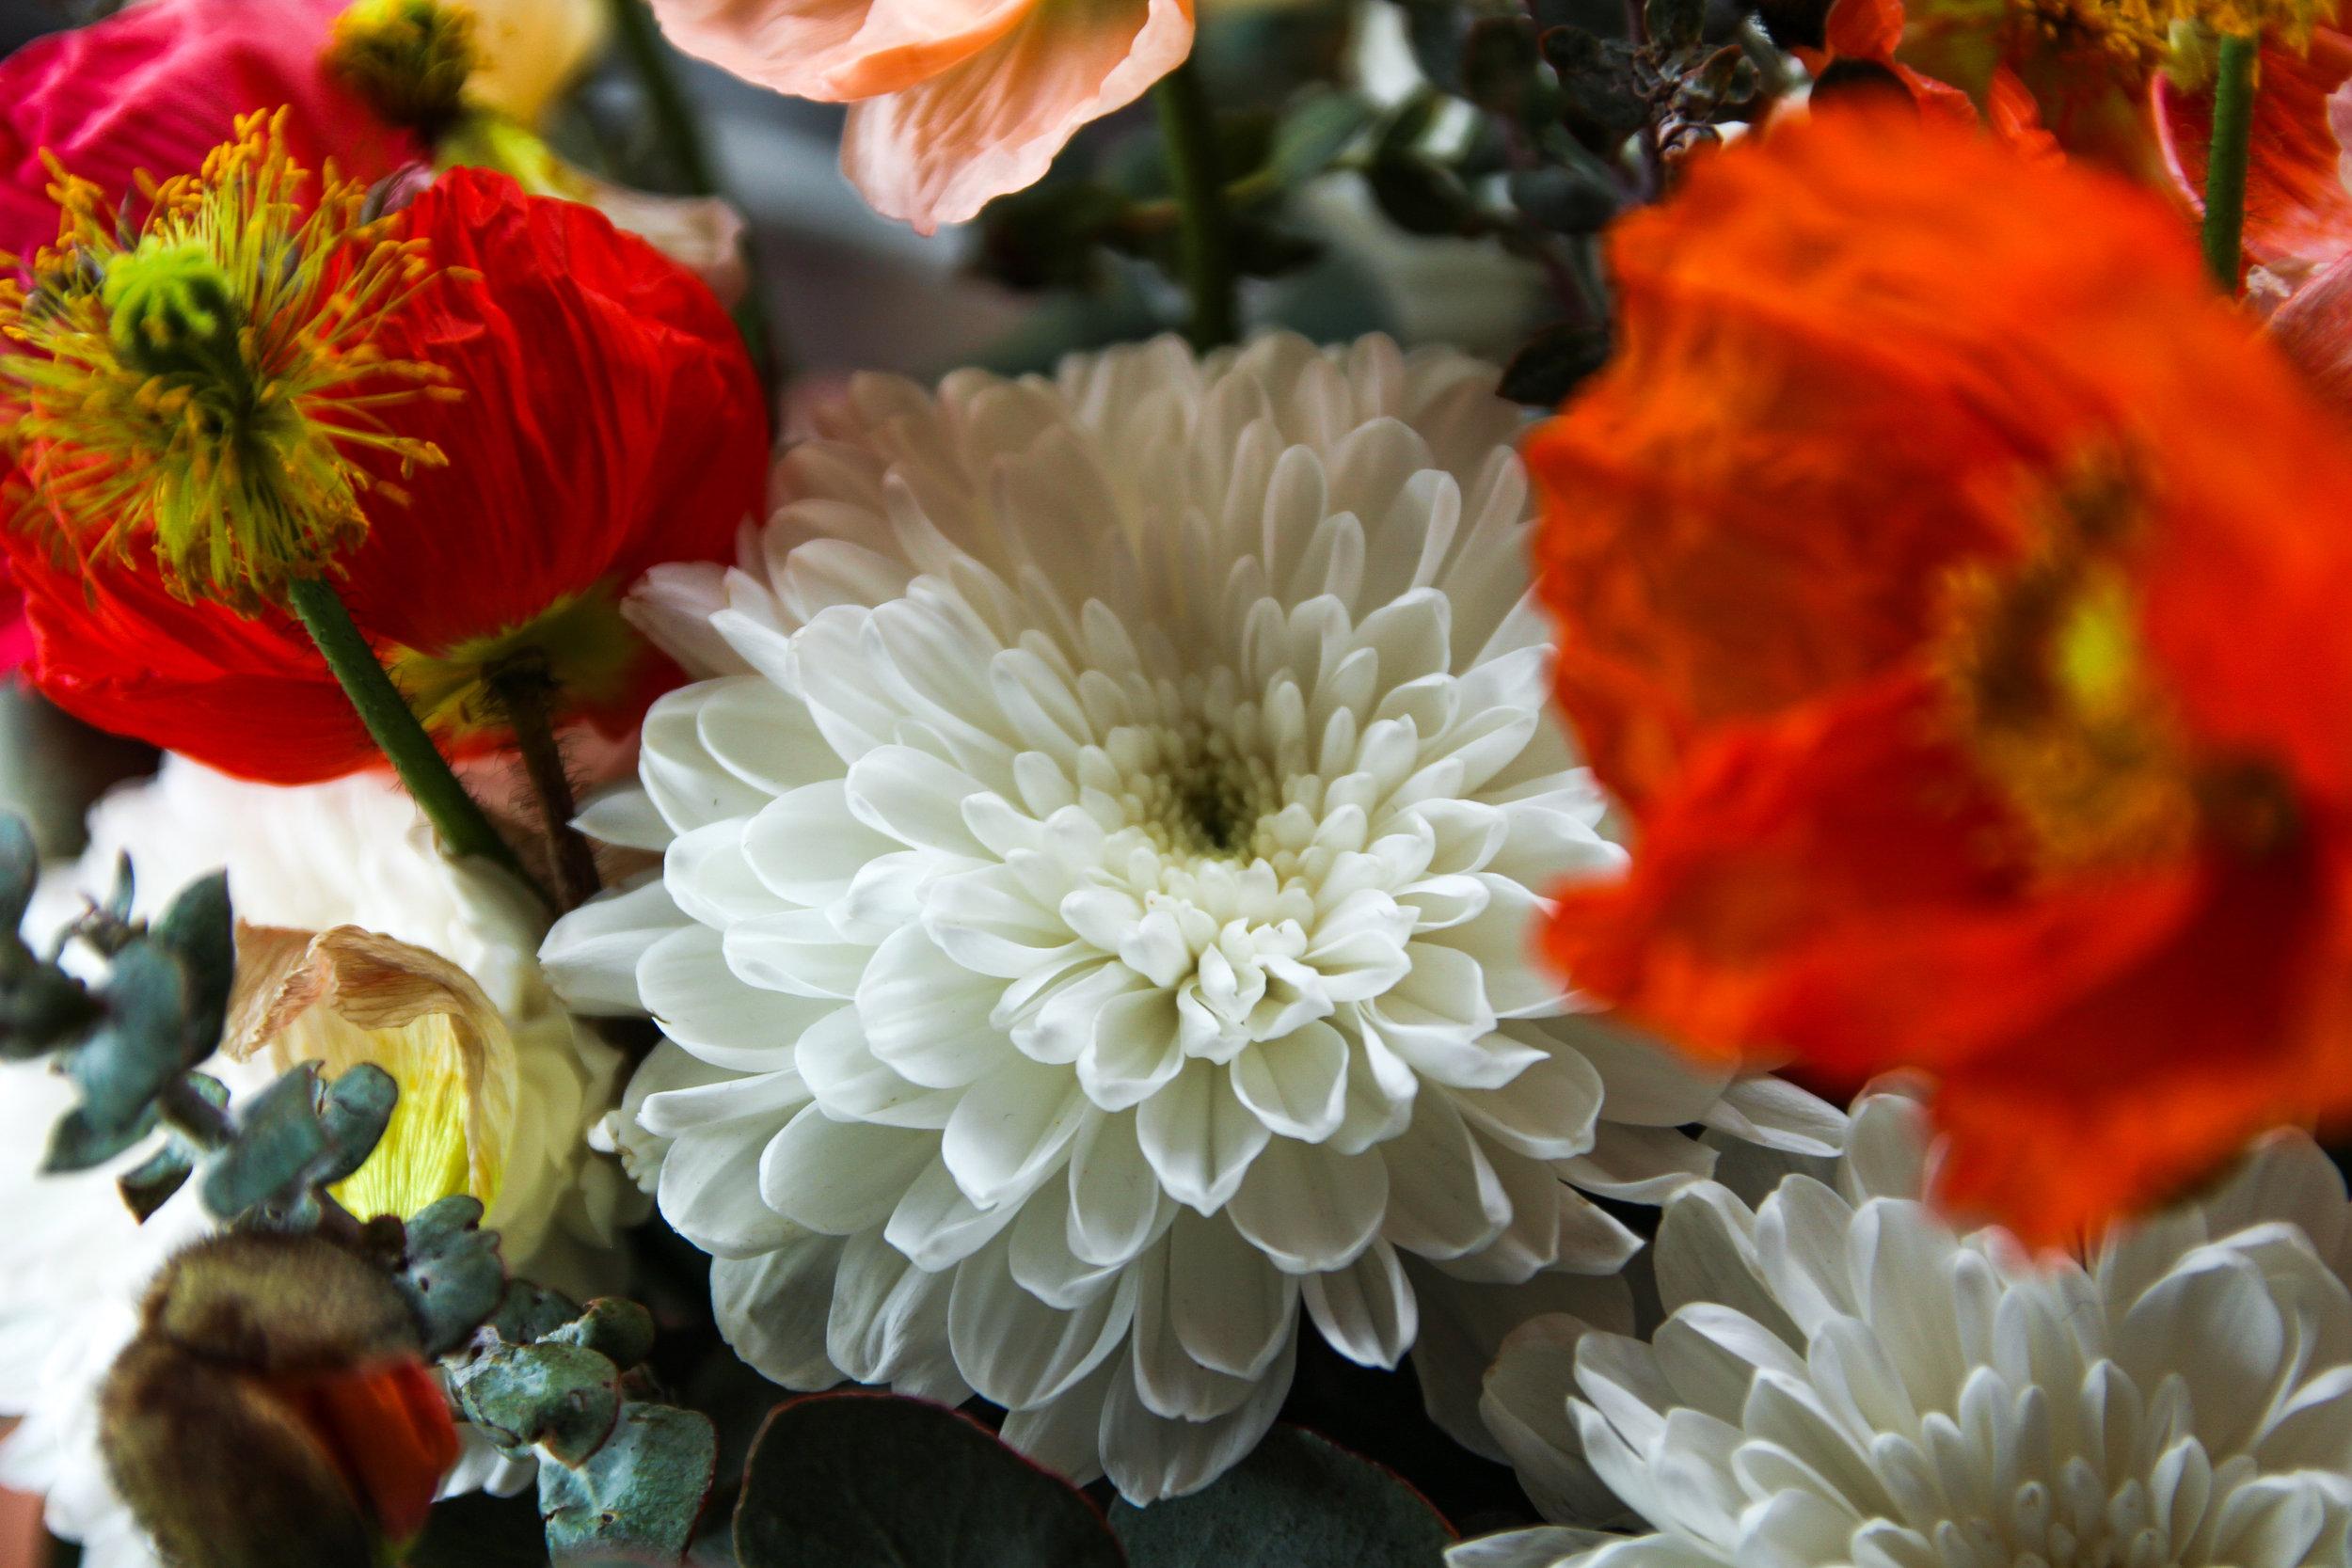 Melbourne, VIC,Australia- Local, seasonal flowers